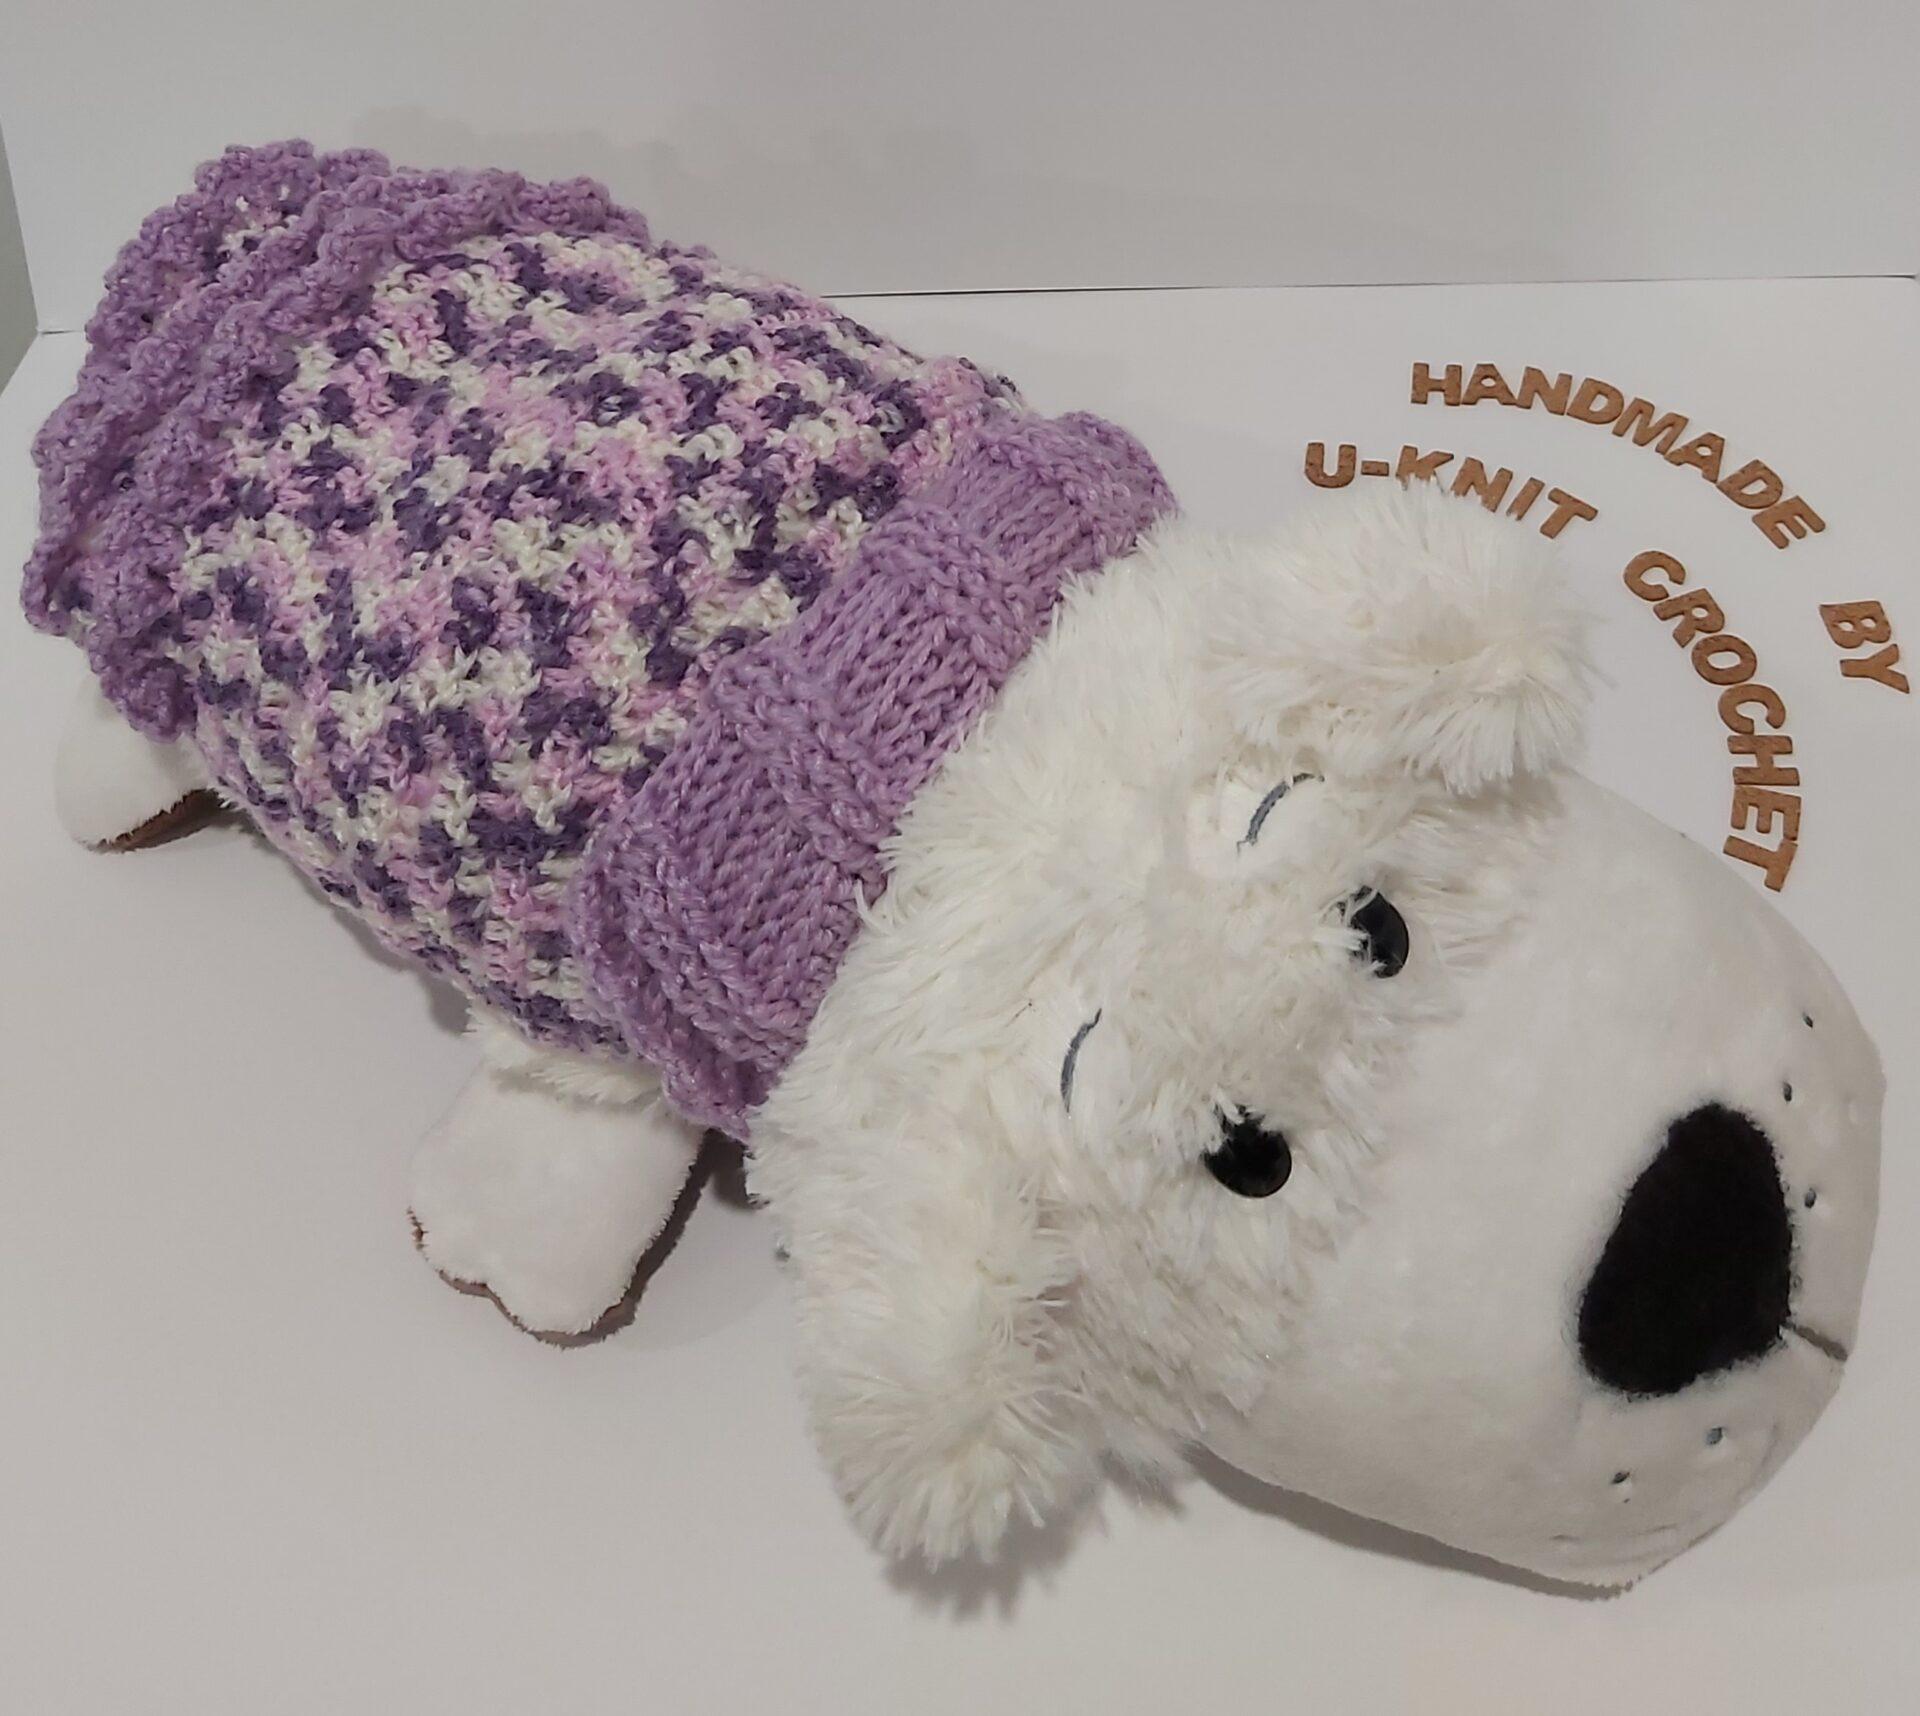 Violet Dog Winter Coat Handmade by U-Knit Crochet U-Knit Crochet (online only)